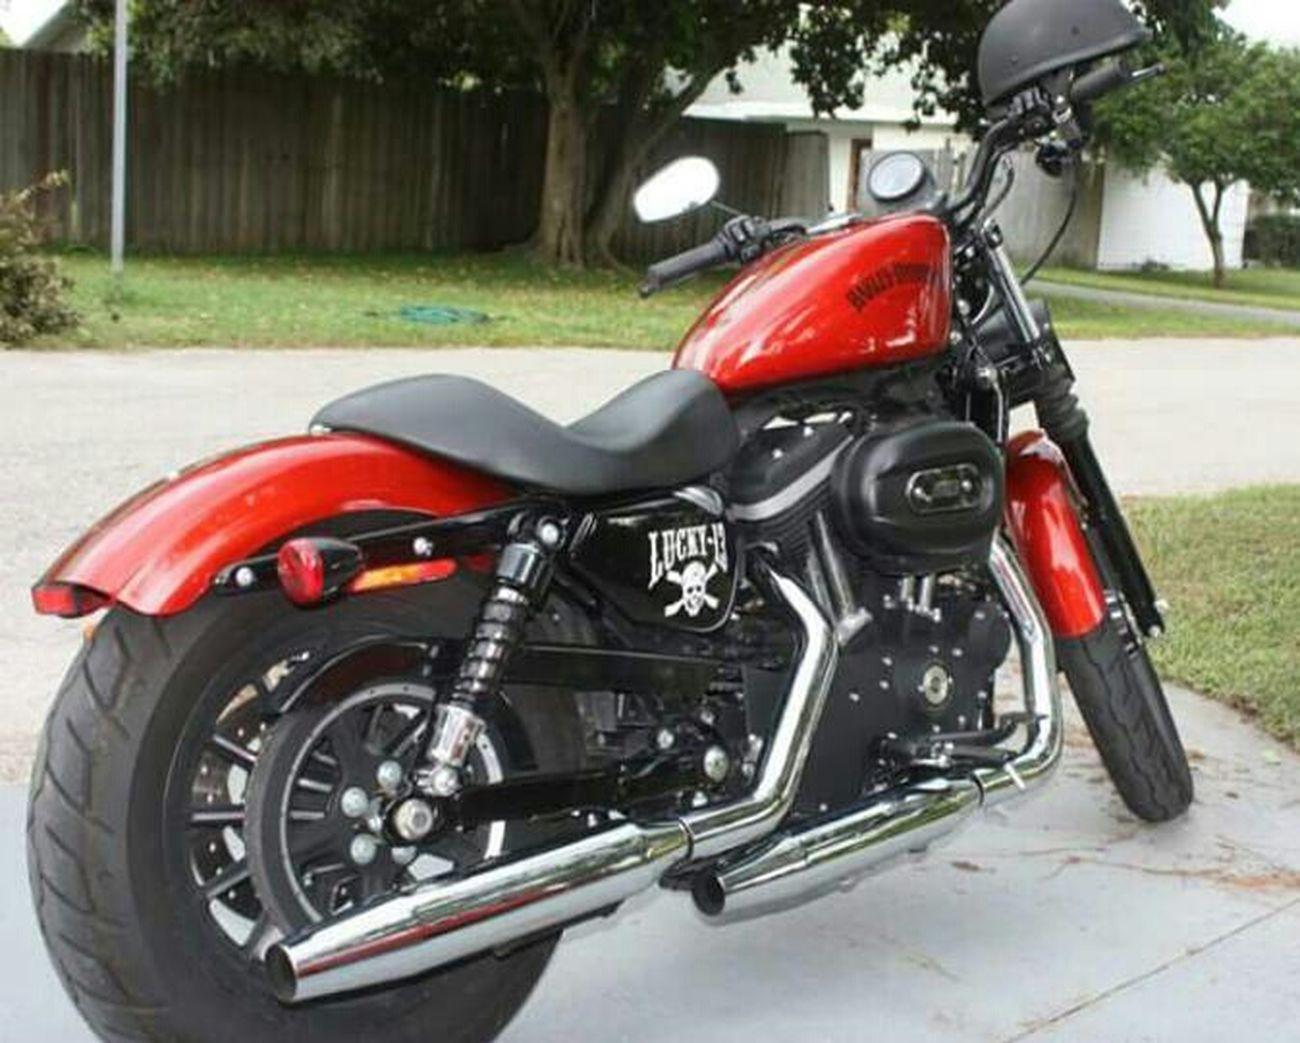 Harley Davidson Harley Davidson Son In Law Bike Lucky 13 Helmet Burnt Orange Shiny